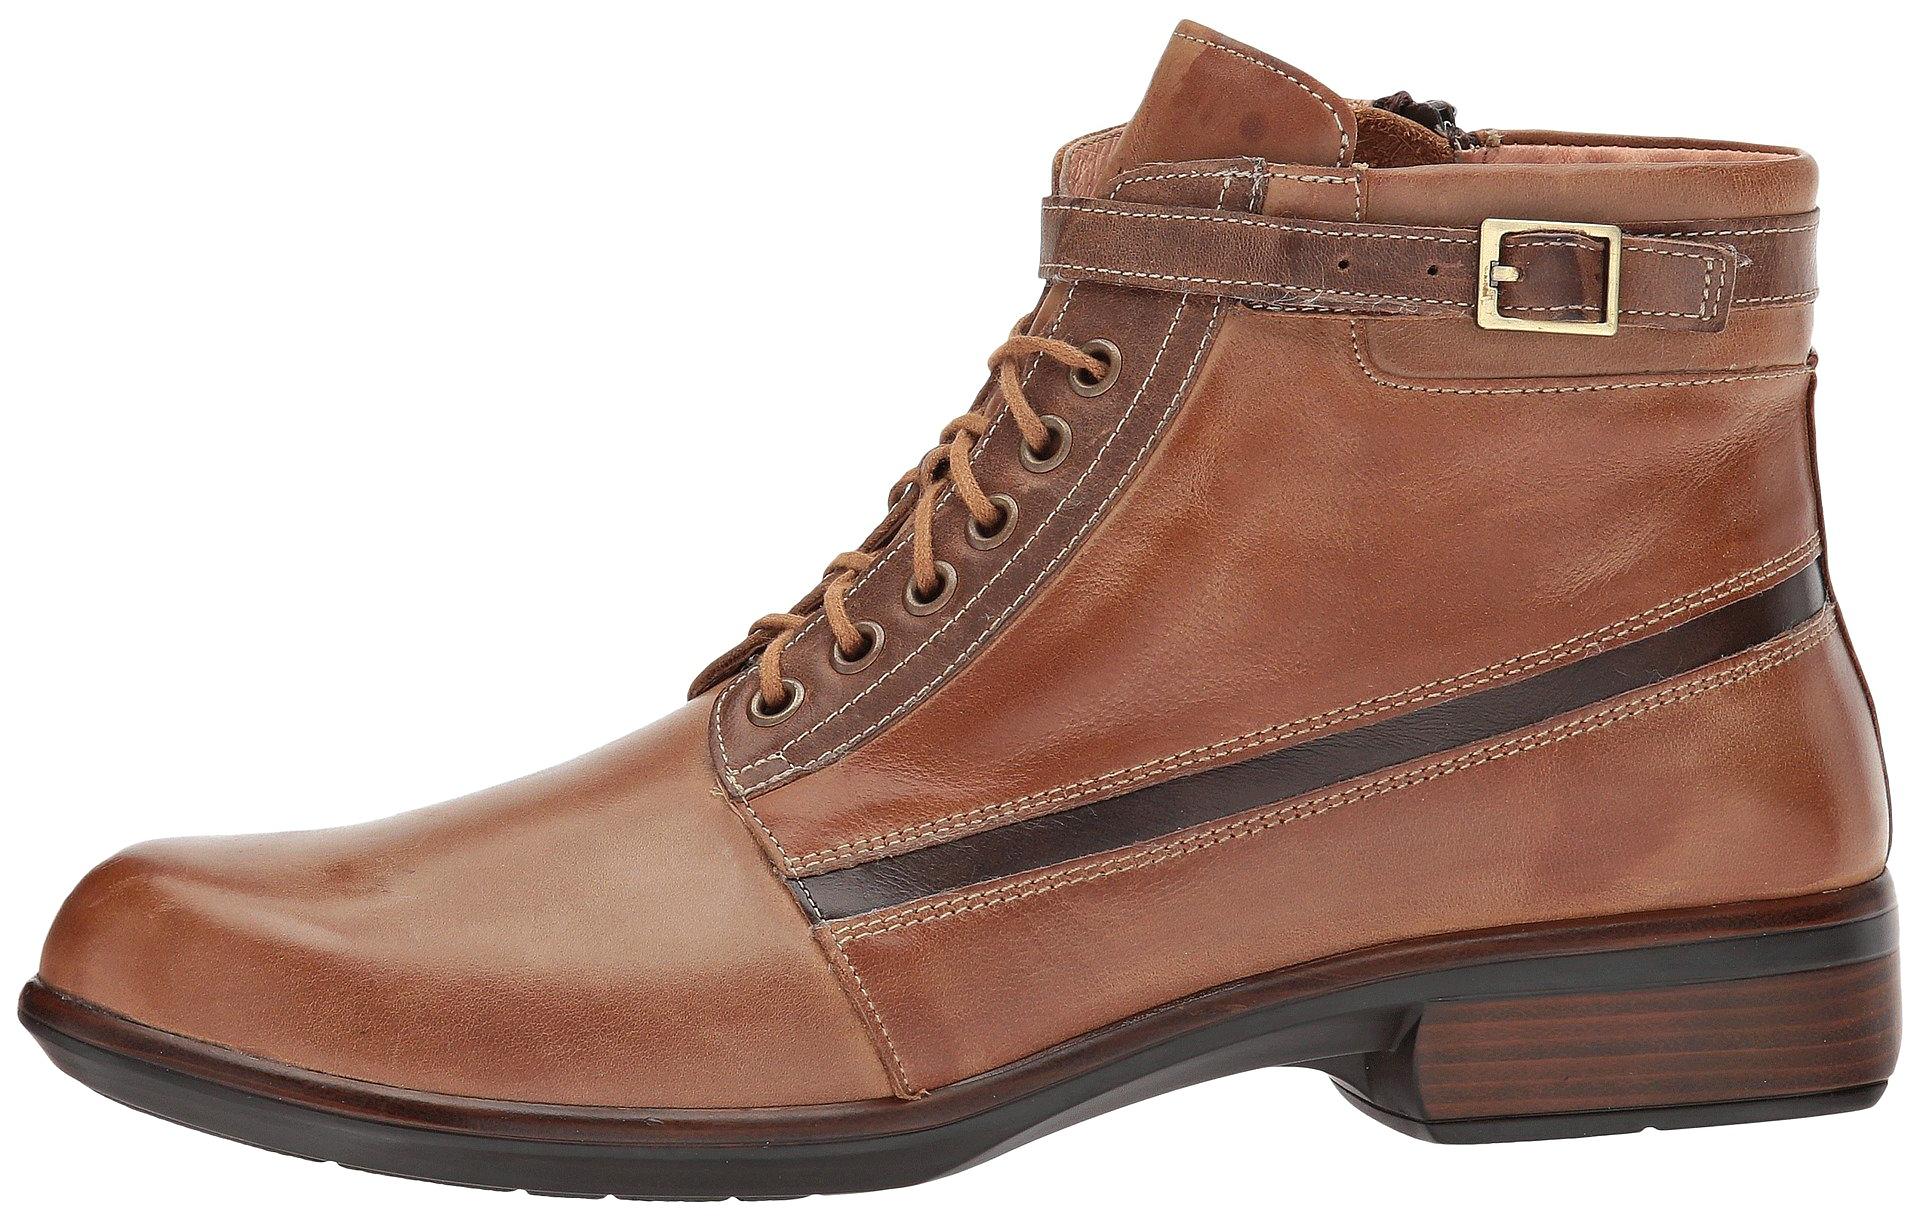 Worksheet Pairs Shoes